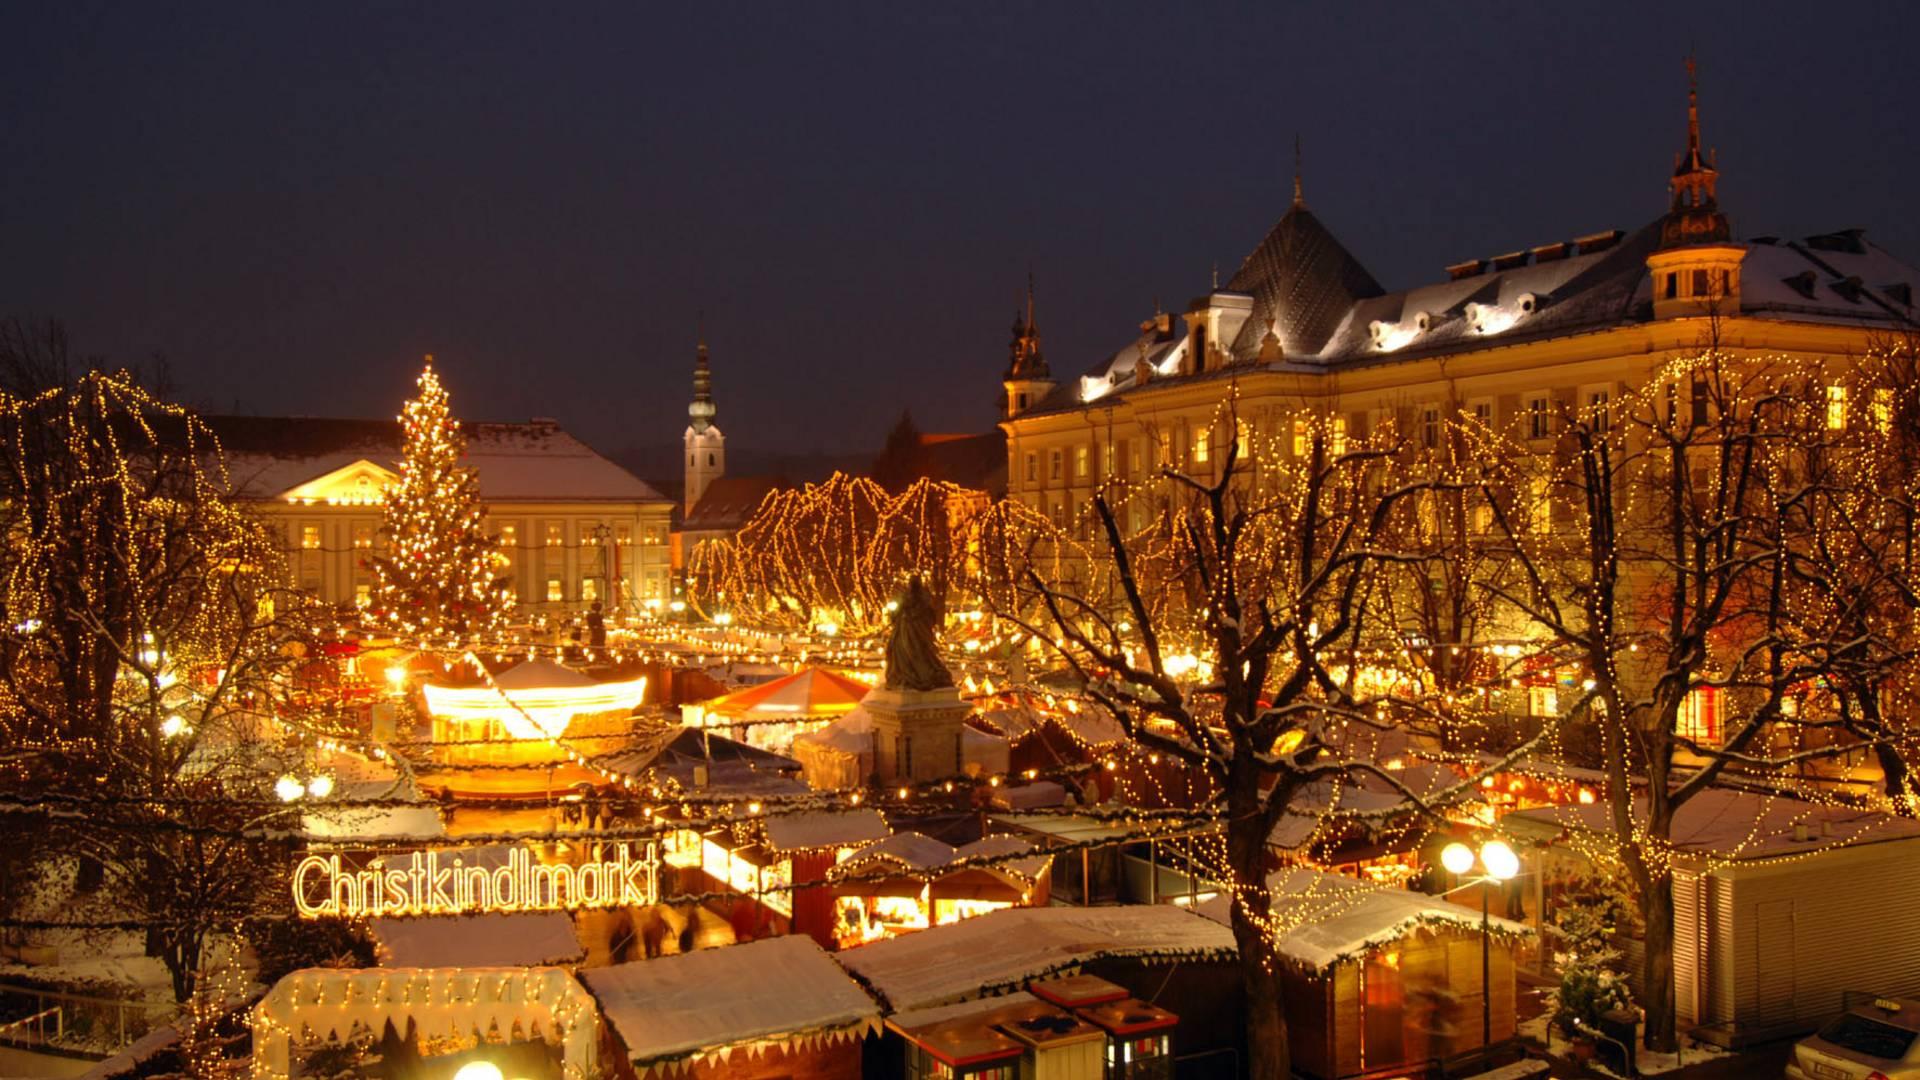 <p>Christkindlmarkt Klagenfurt</p>